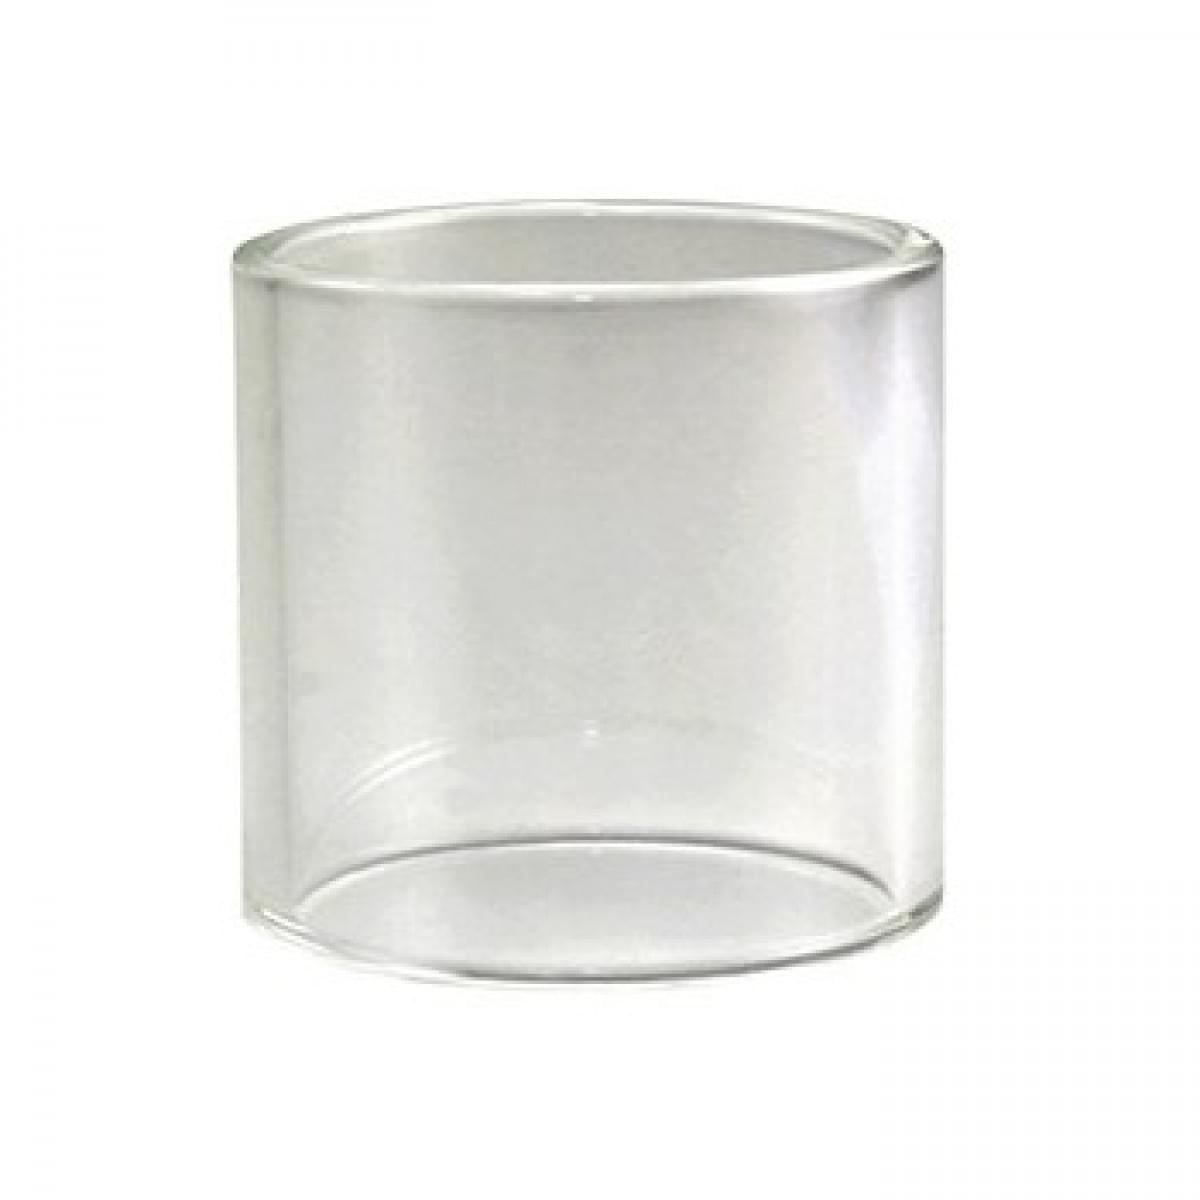 Aspire - Nautilus 2 Pyrex Glass